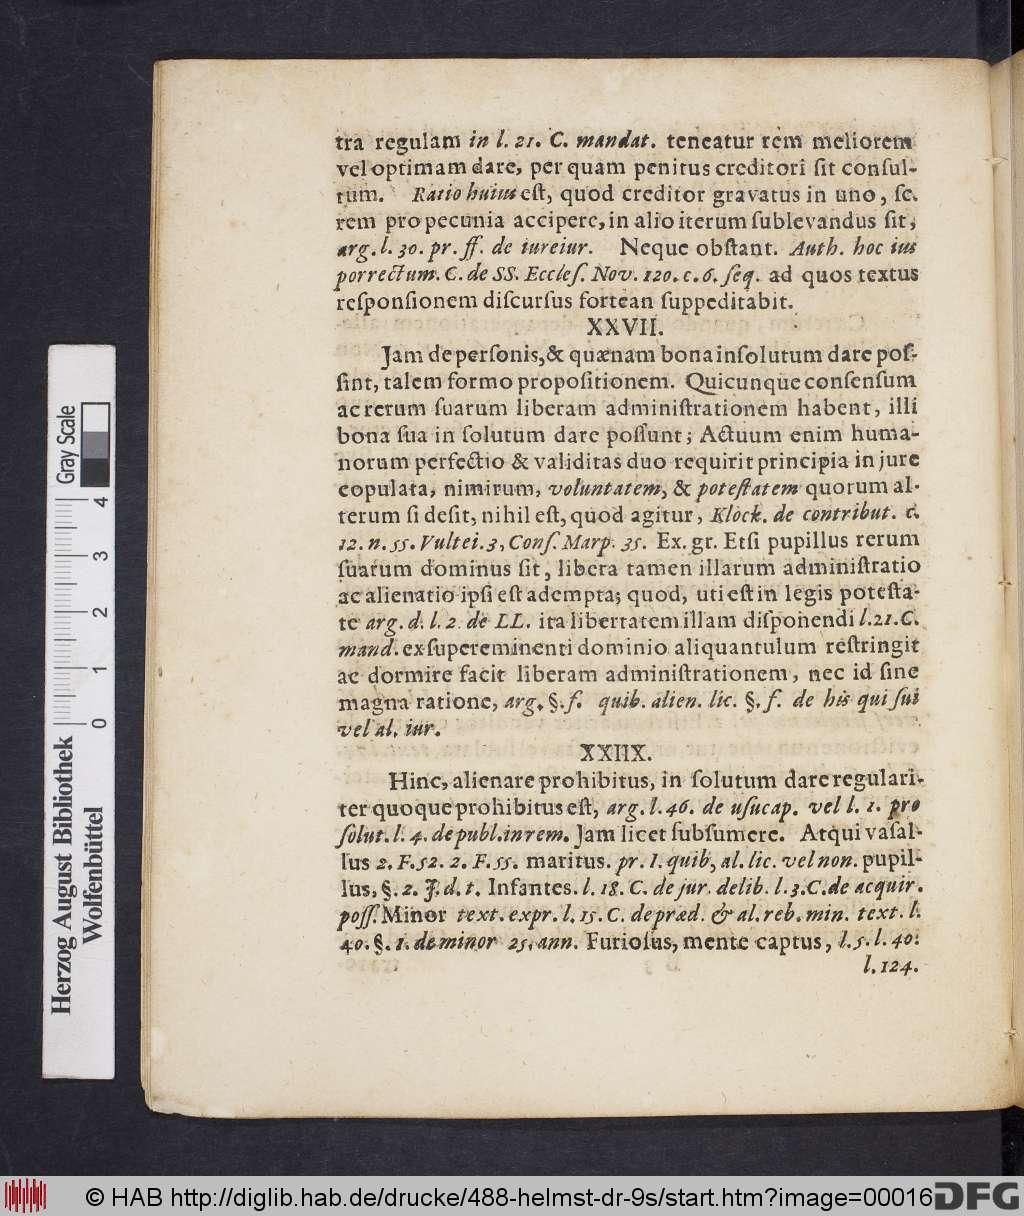 http://diglib.hab.de/drucke/488-helmst-dr-9s/00016.jpg